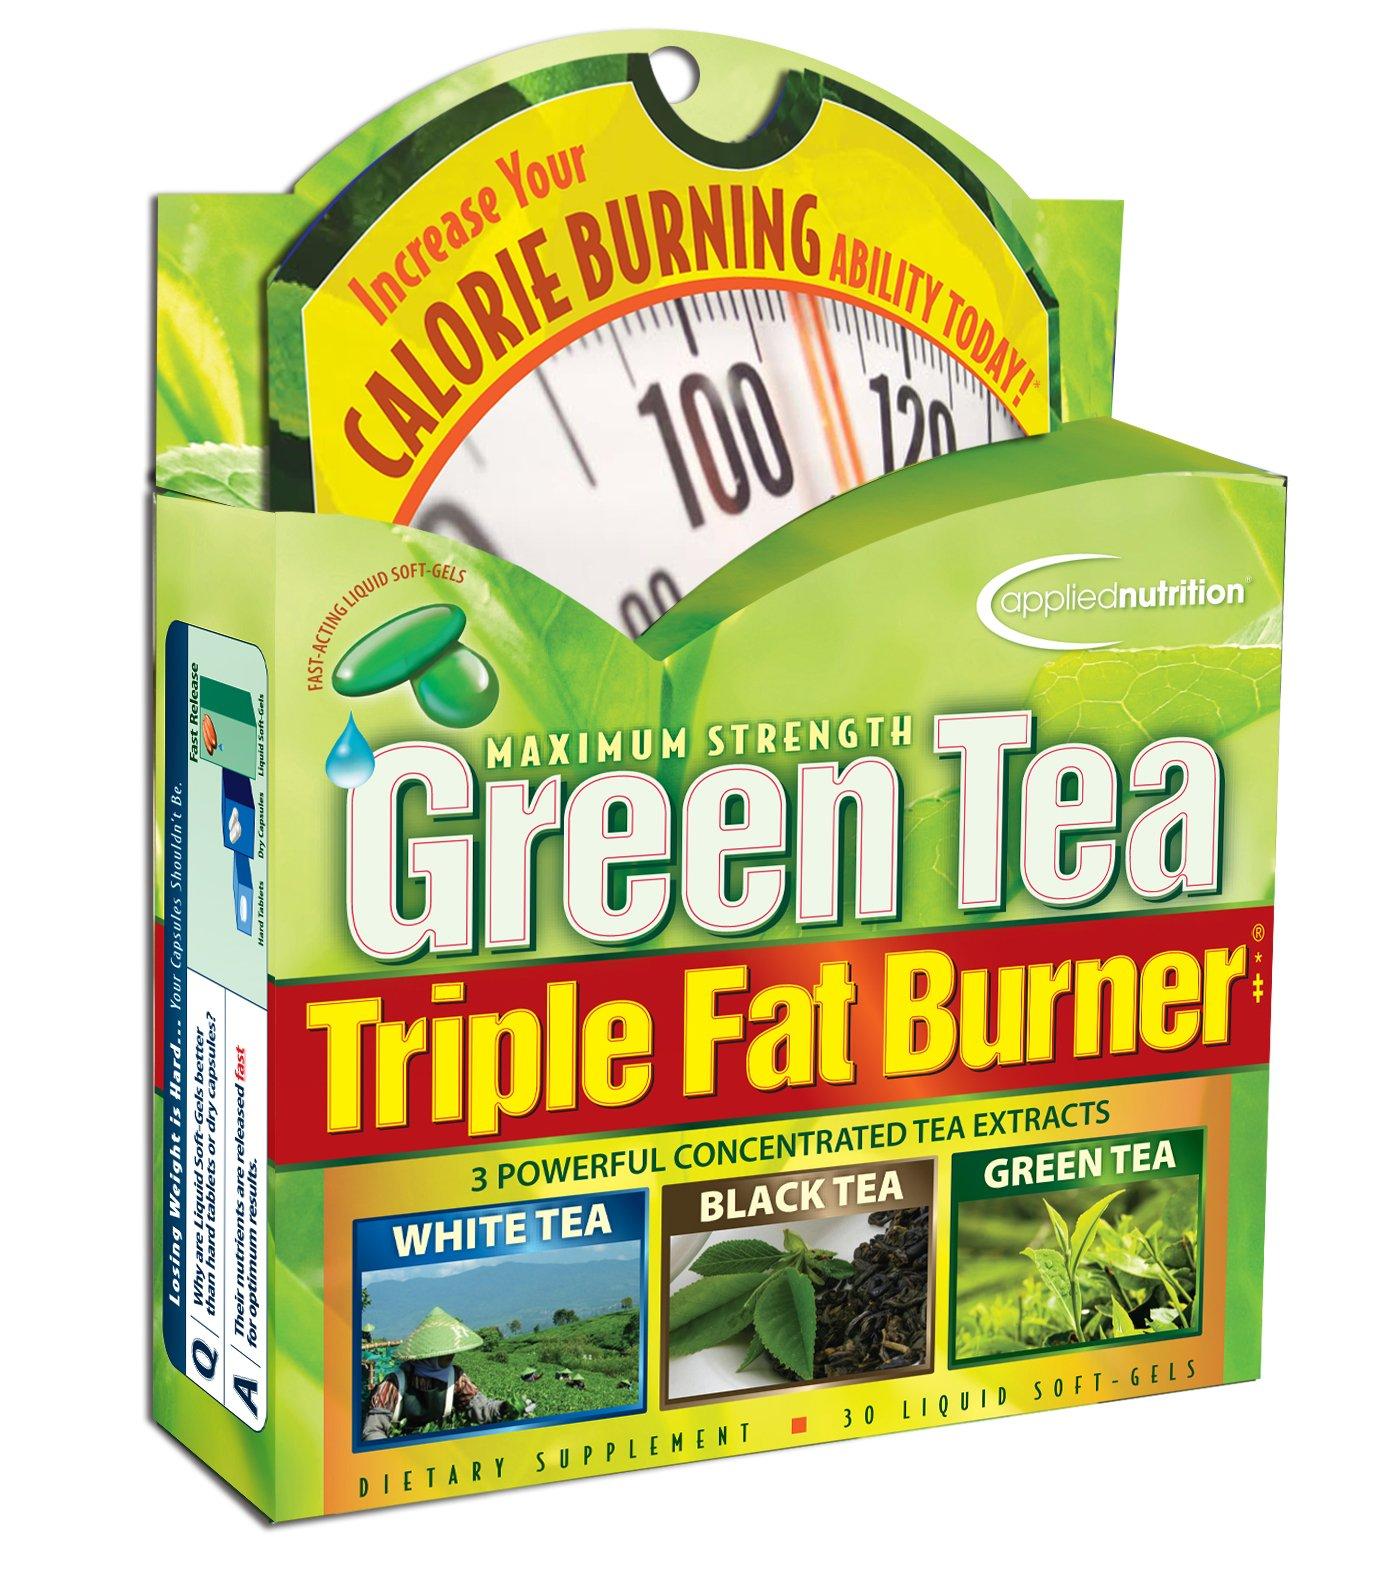 Applied Nutrition Green Tea Triple Fat Burner, 30 Liquid Soft-Gels (Pack of 3) by Applied Nutrition